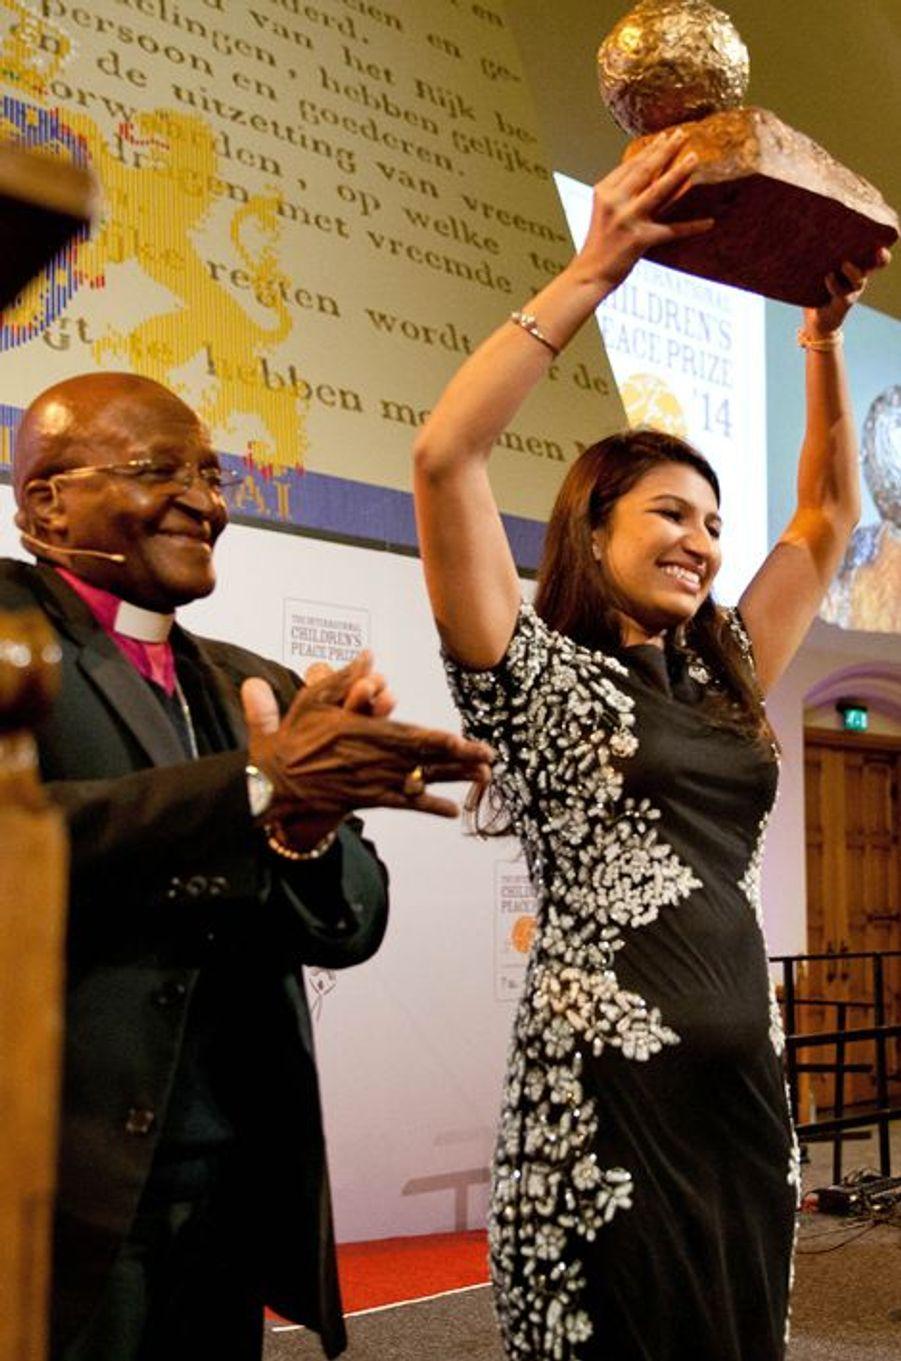 Desmond Tutu et Neha Gupta à La Haye, le 18 octobre 2014